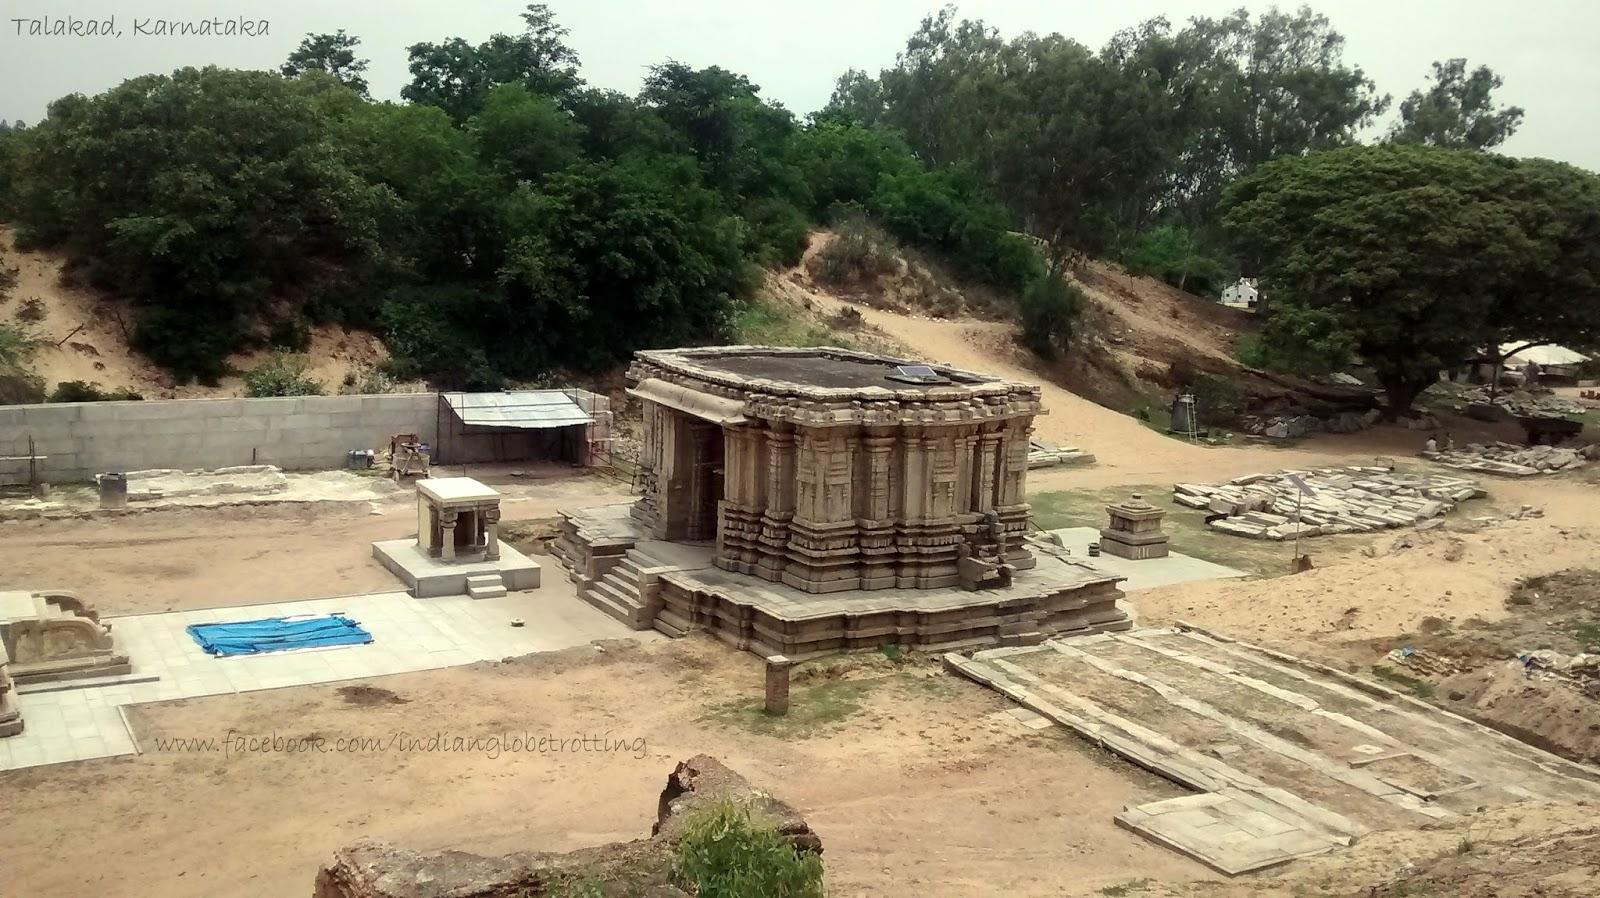 Mahadwara of Kirtinarayana temple in talakad